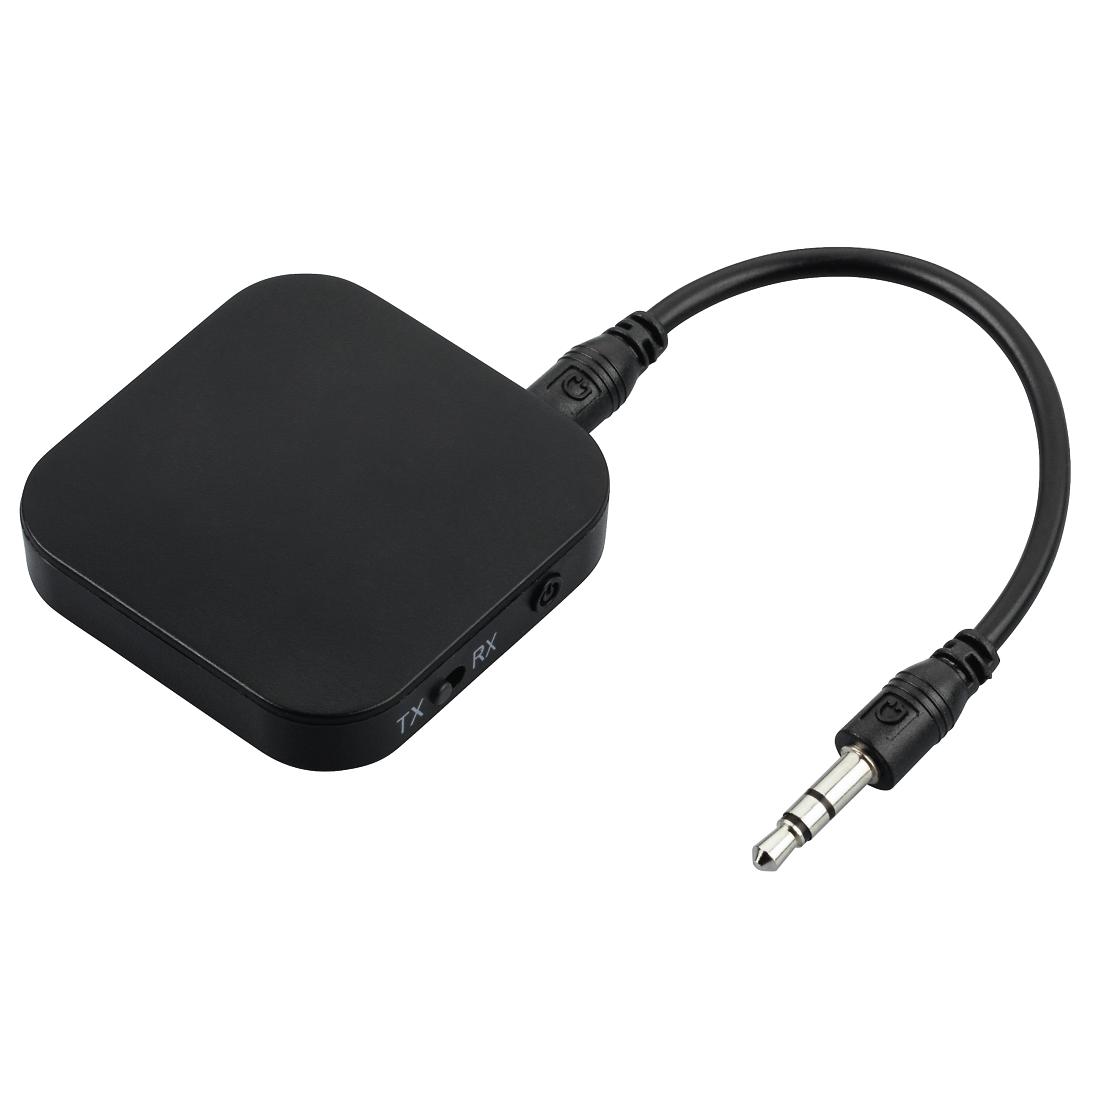 137473 hama bluetooth audio zender ontvanger 2in1. Black Bedroom Furniture Sets. Home Design Ideas